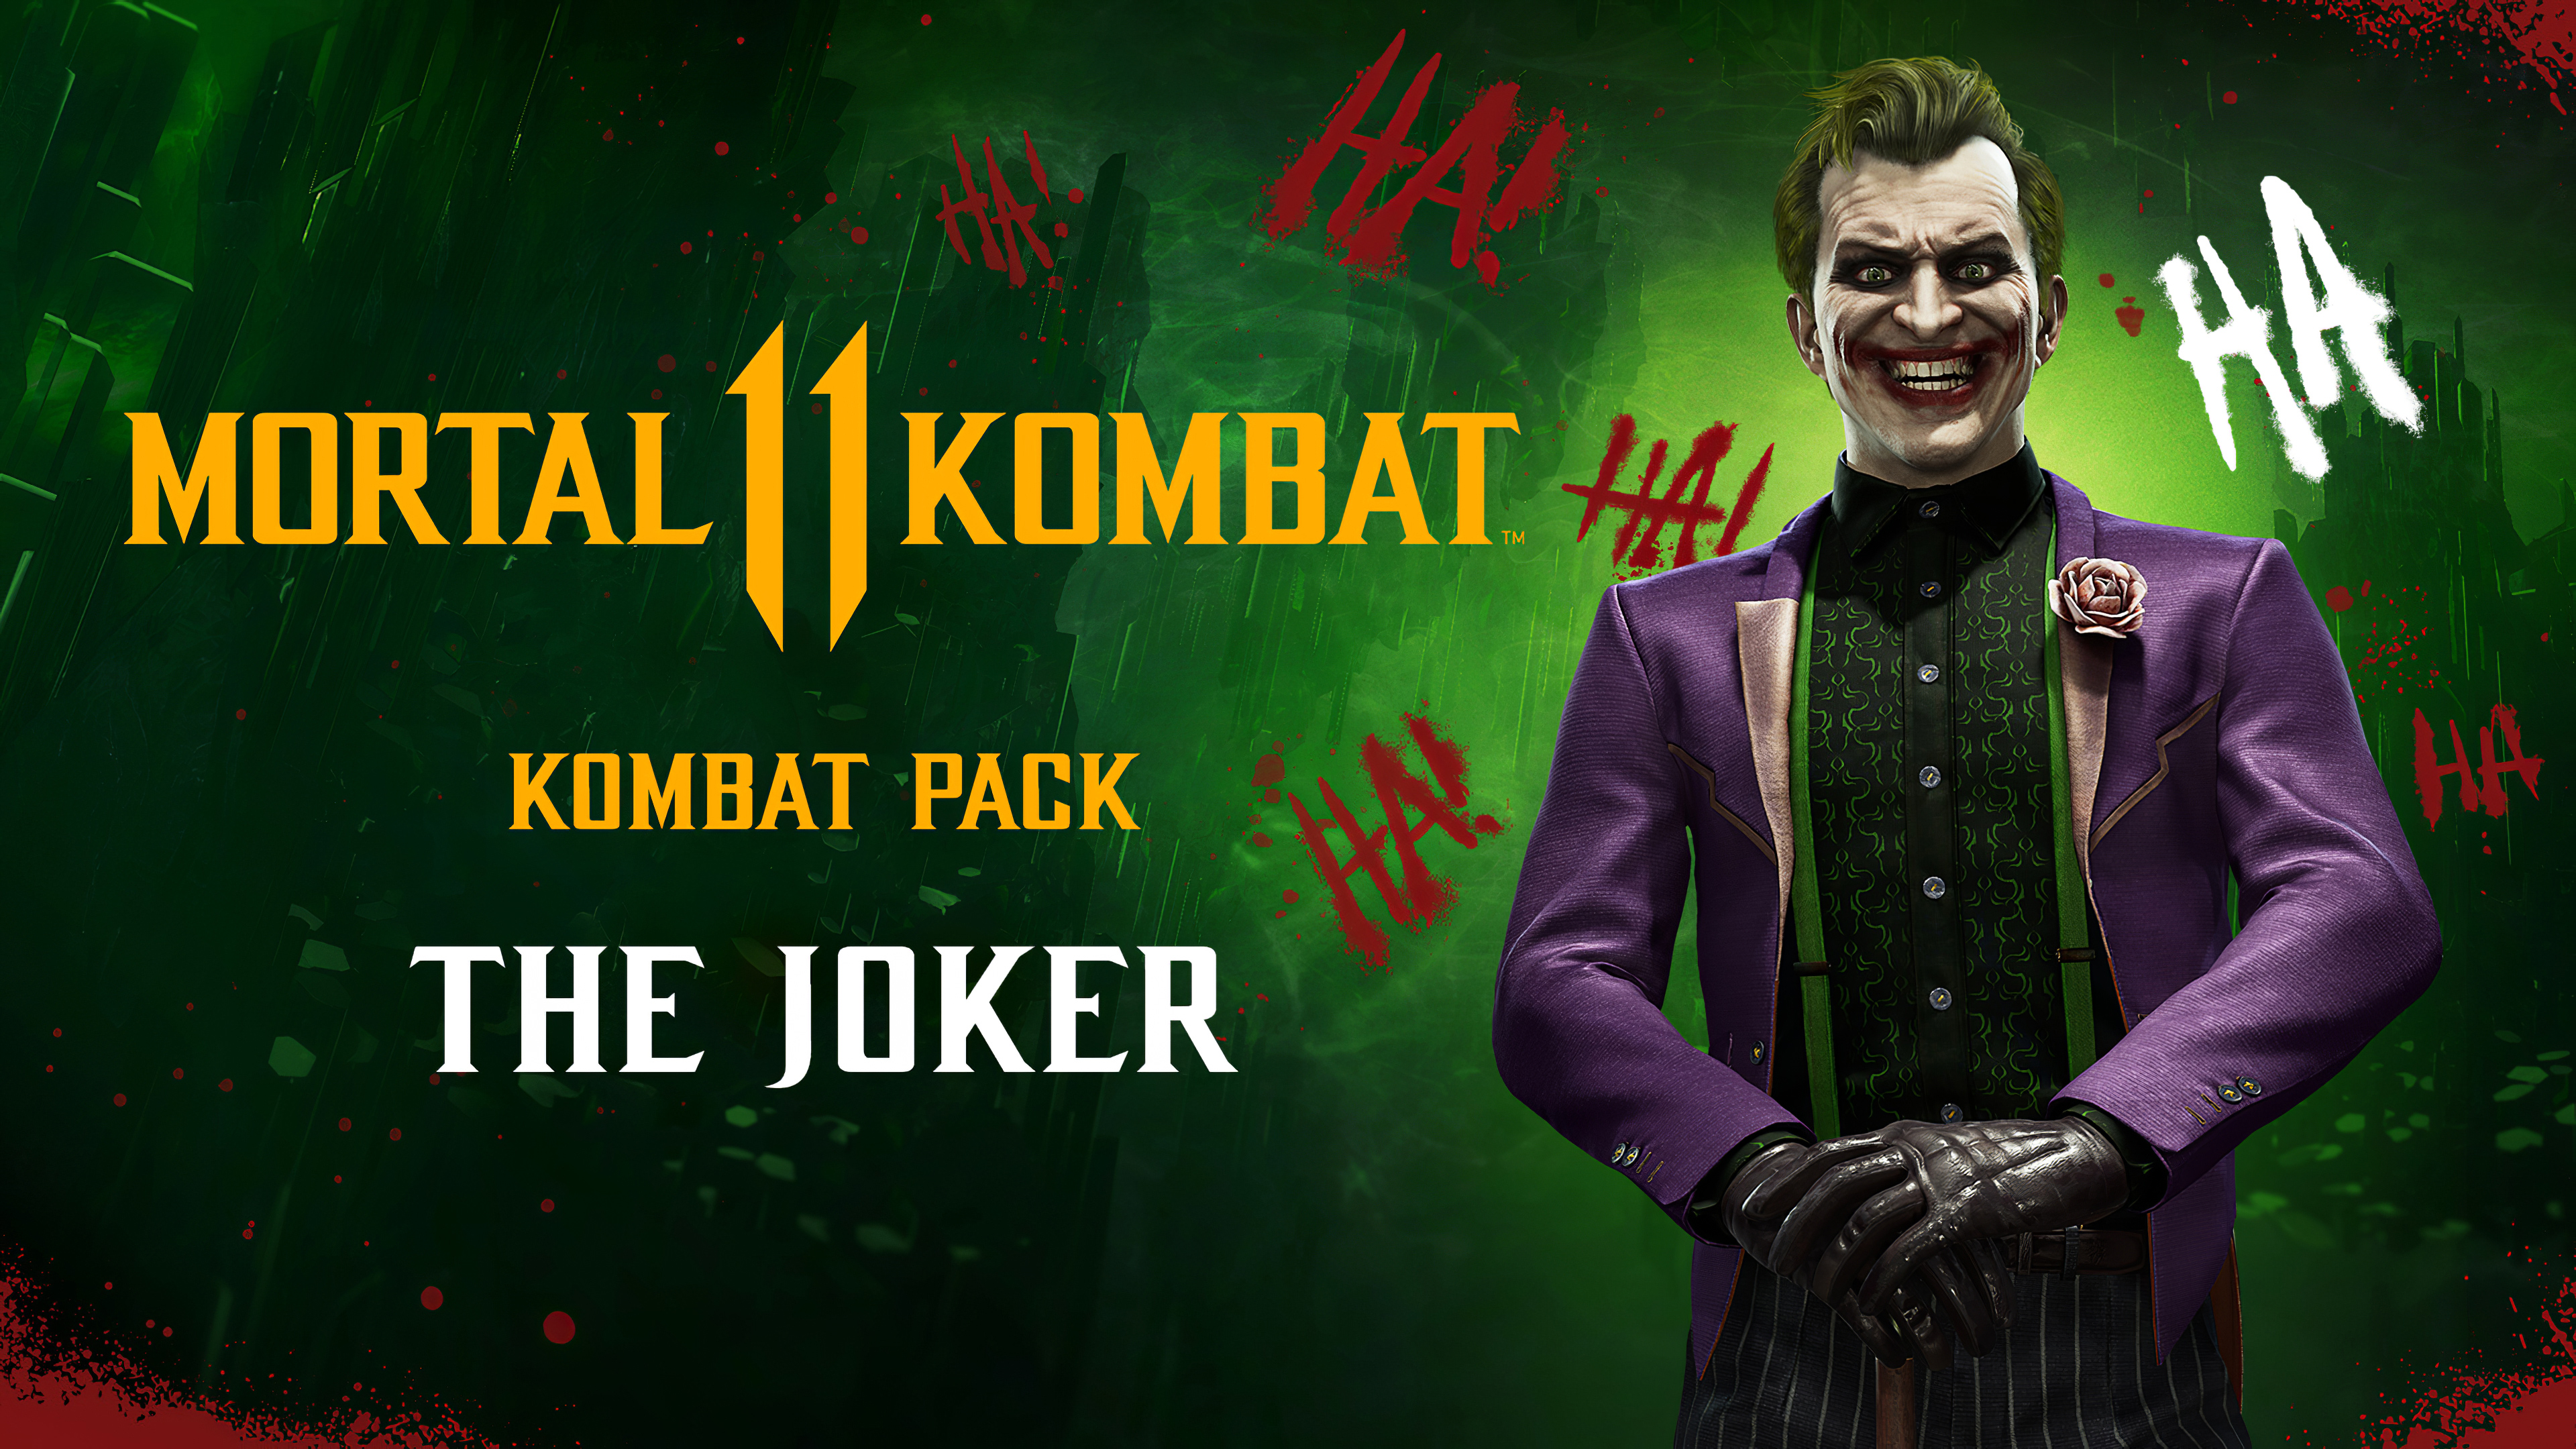 The Joker Mortal Kombat 11 Hd Games 4k Wallpapers Images